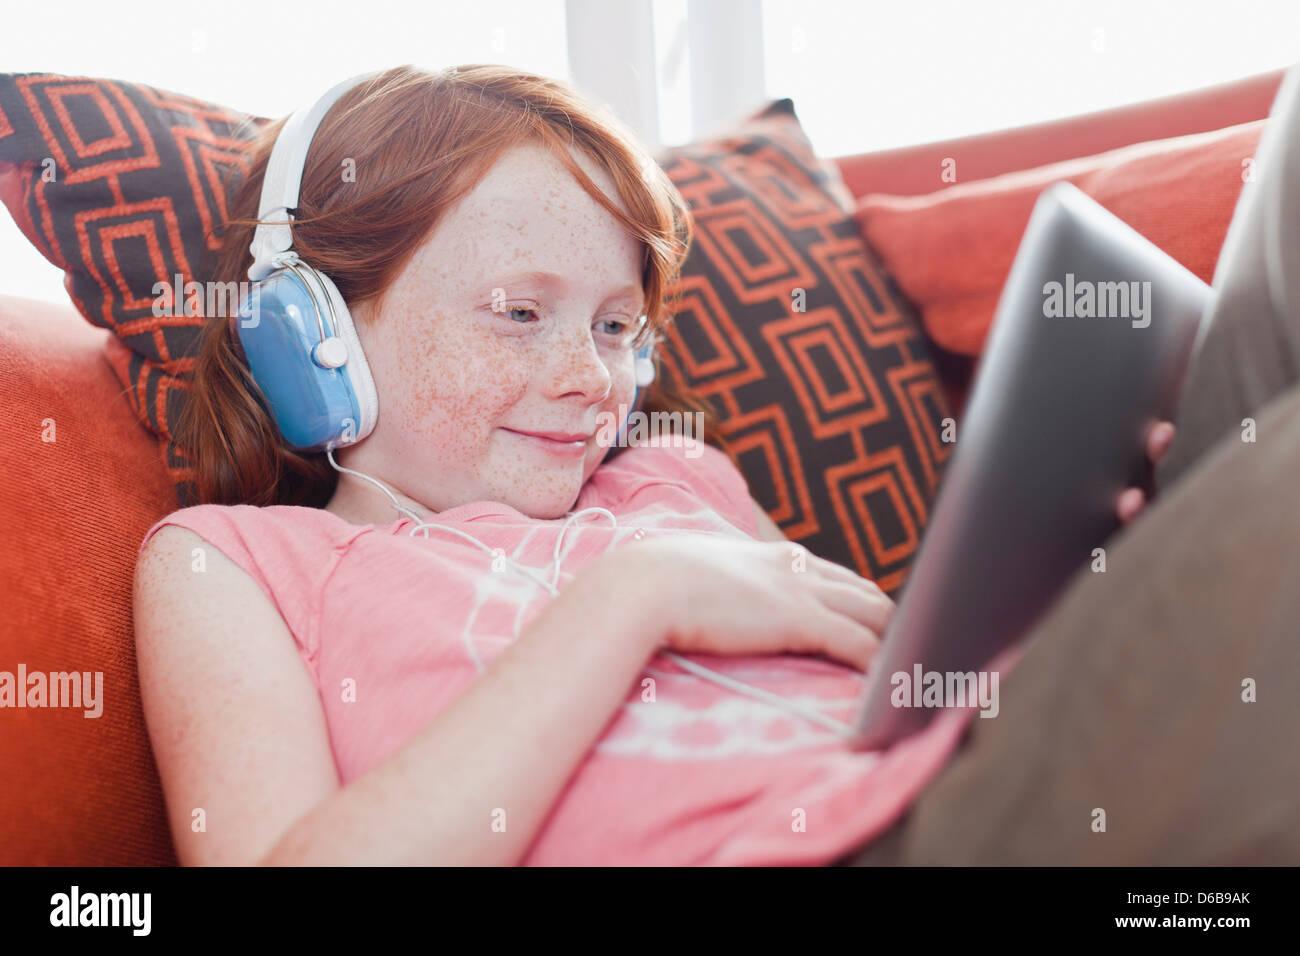 Girl in headphones using tablet computer - Stock Image